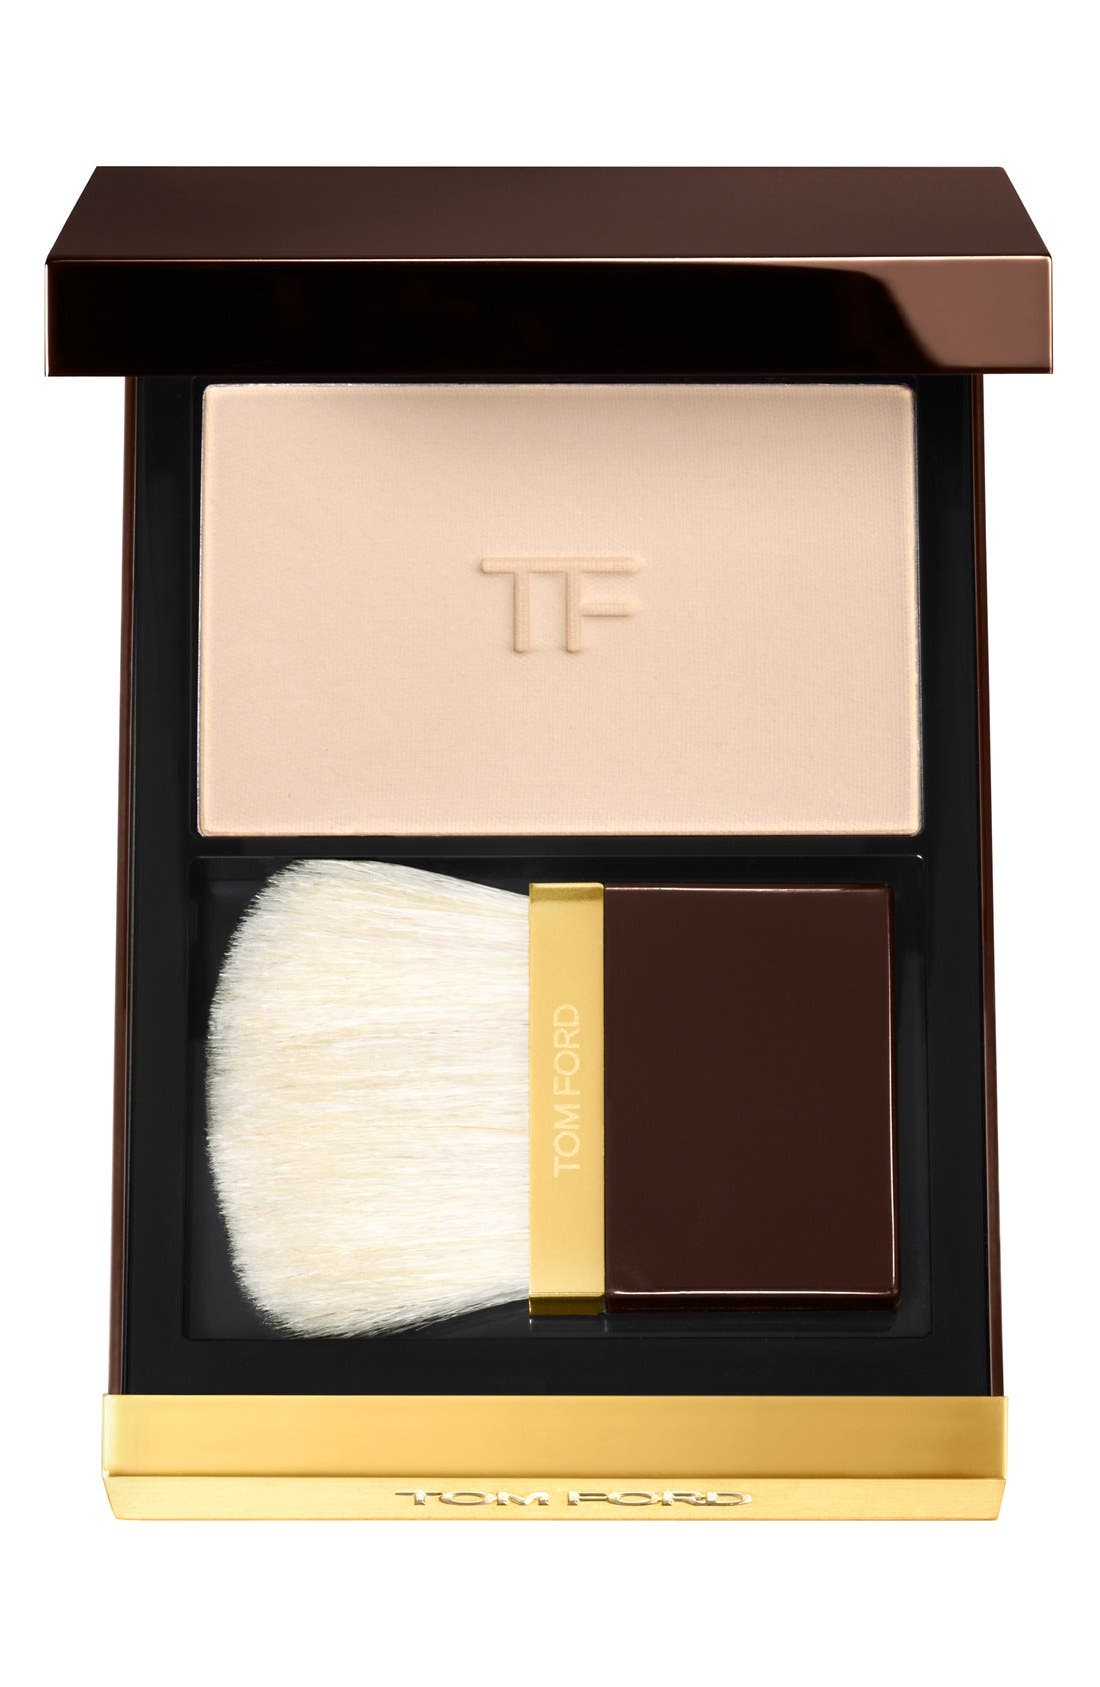 Good Tom Ford Translucent Finishing Powder